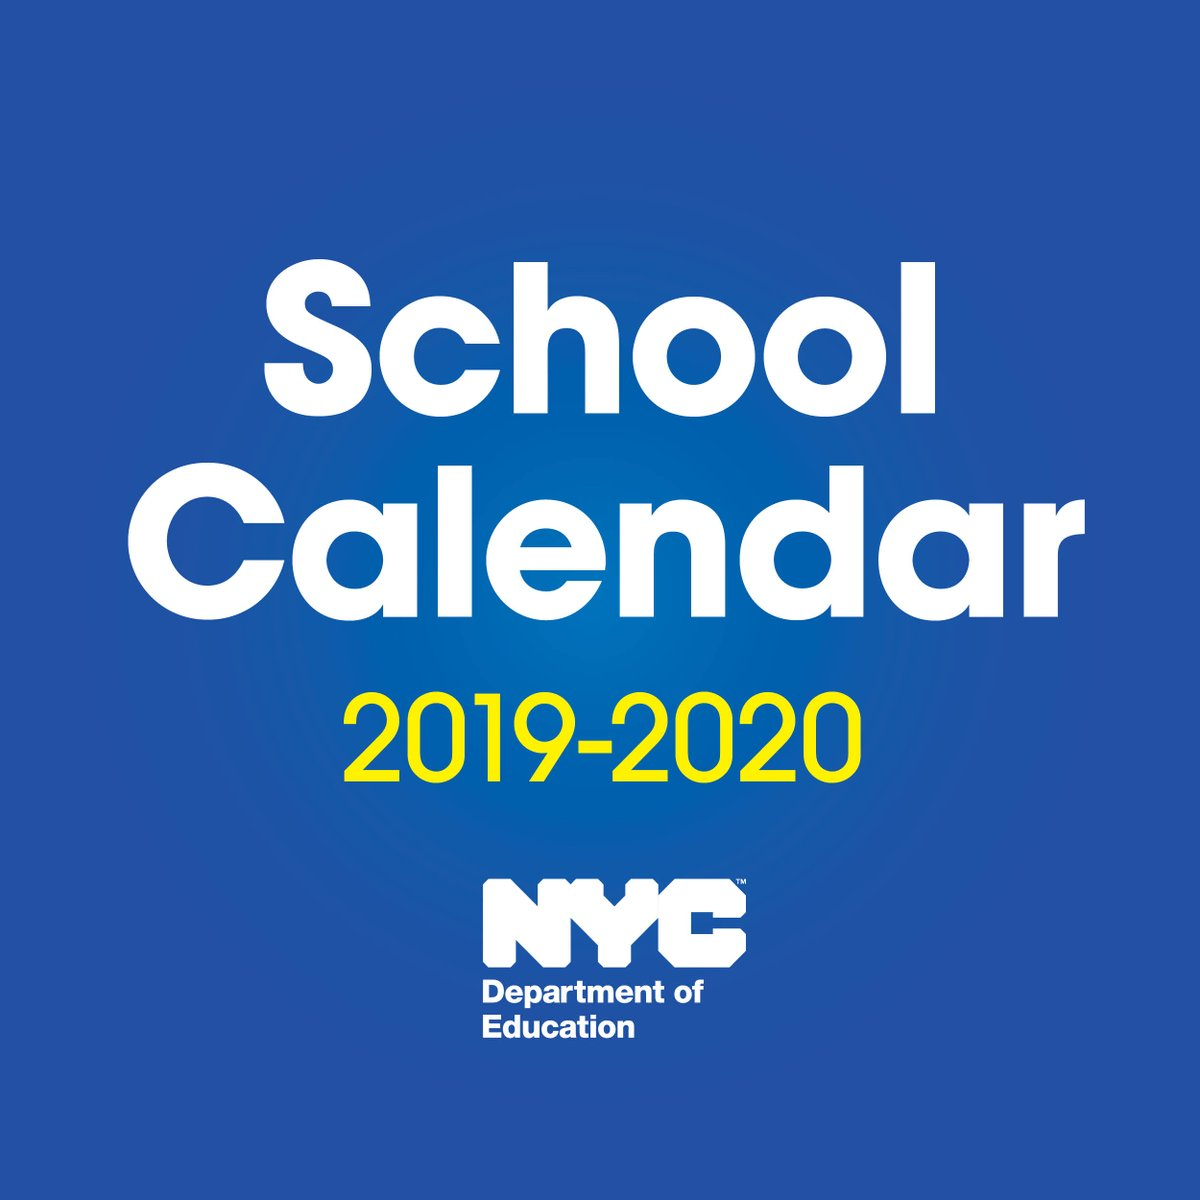 New York City Public School Calendar 2019 NYC Public Schools on Twitter: